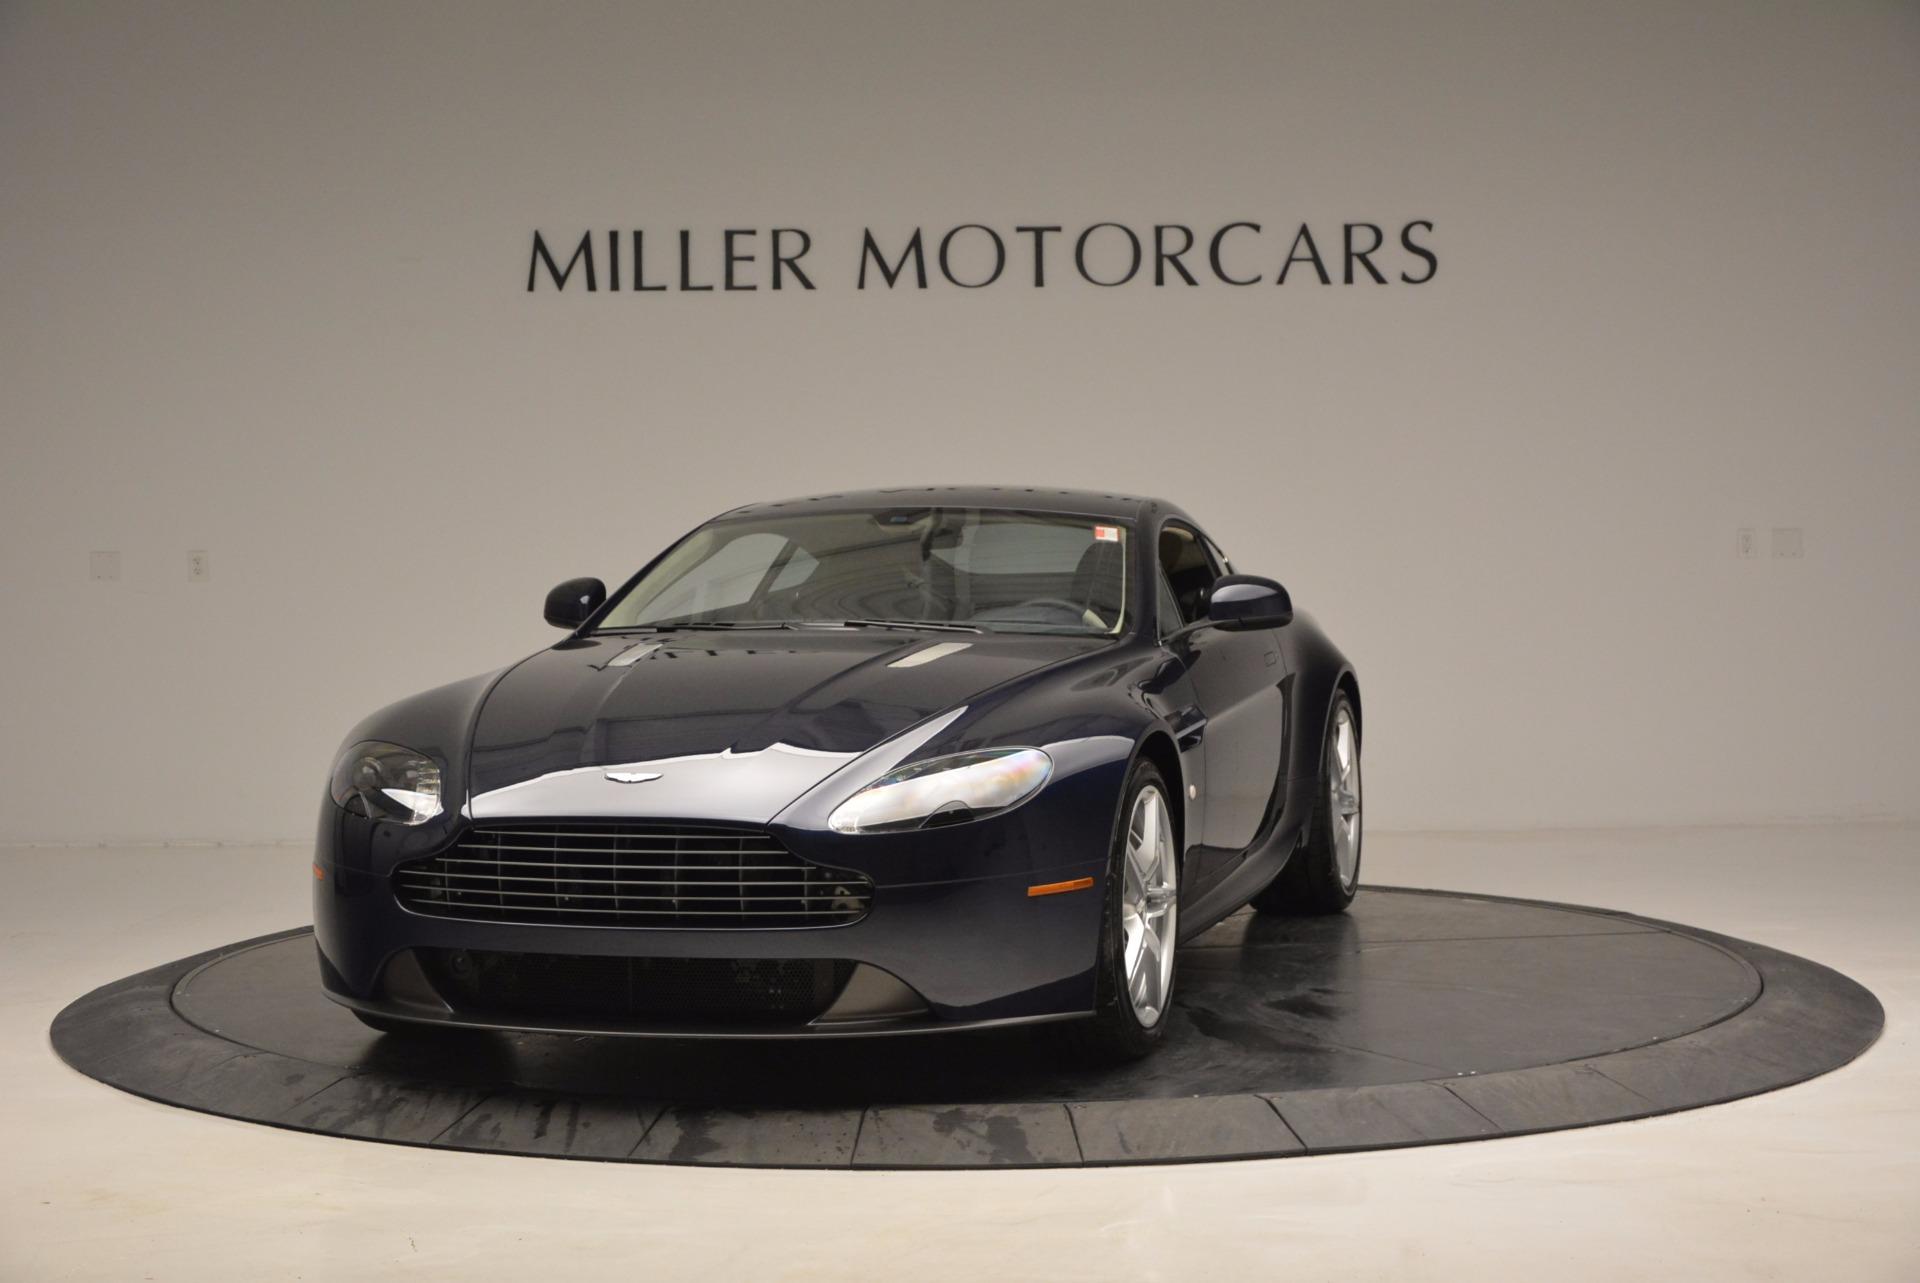 Used 2016 Aston Martin V8 Vantage for sale Sold at Aston Martin of Greenwich in Greenwich CT 06830 1